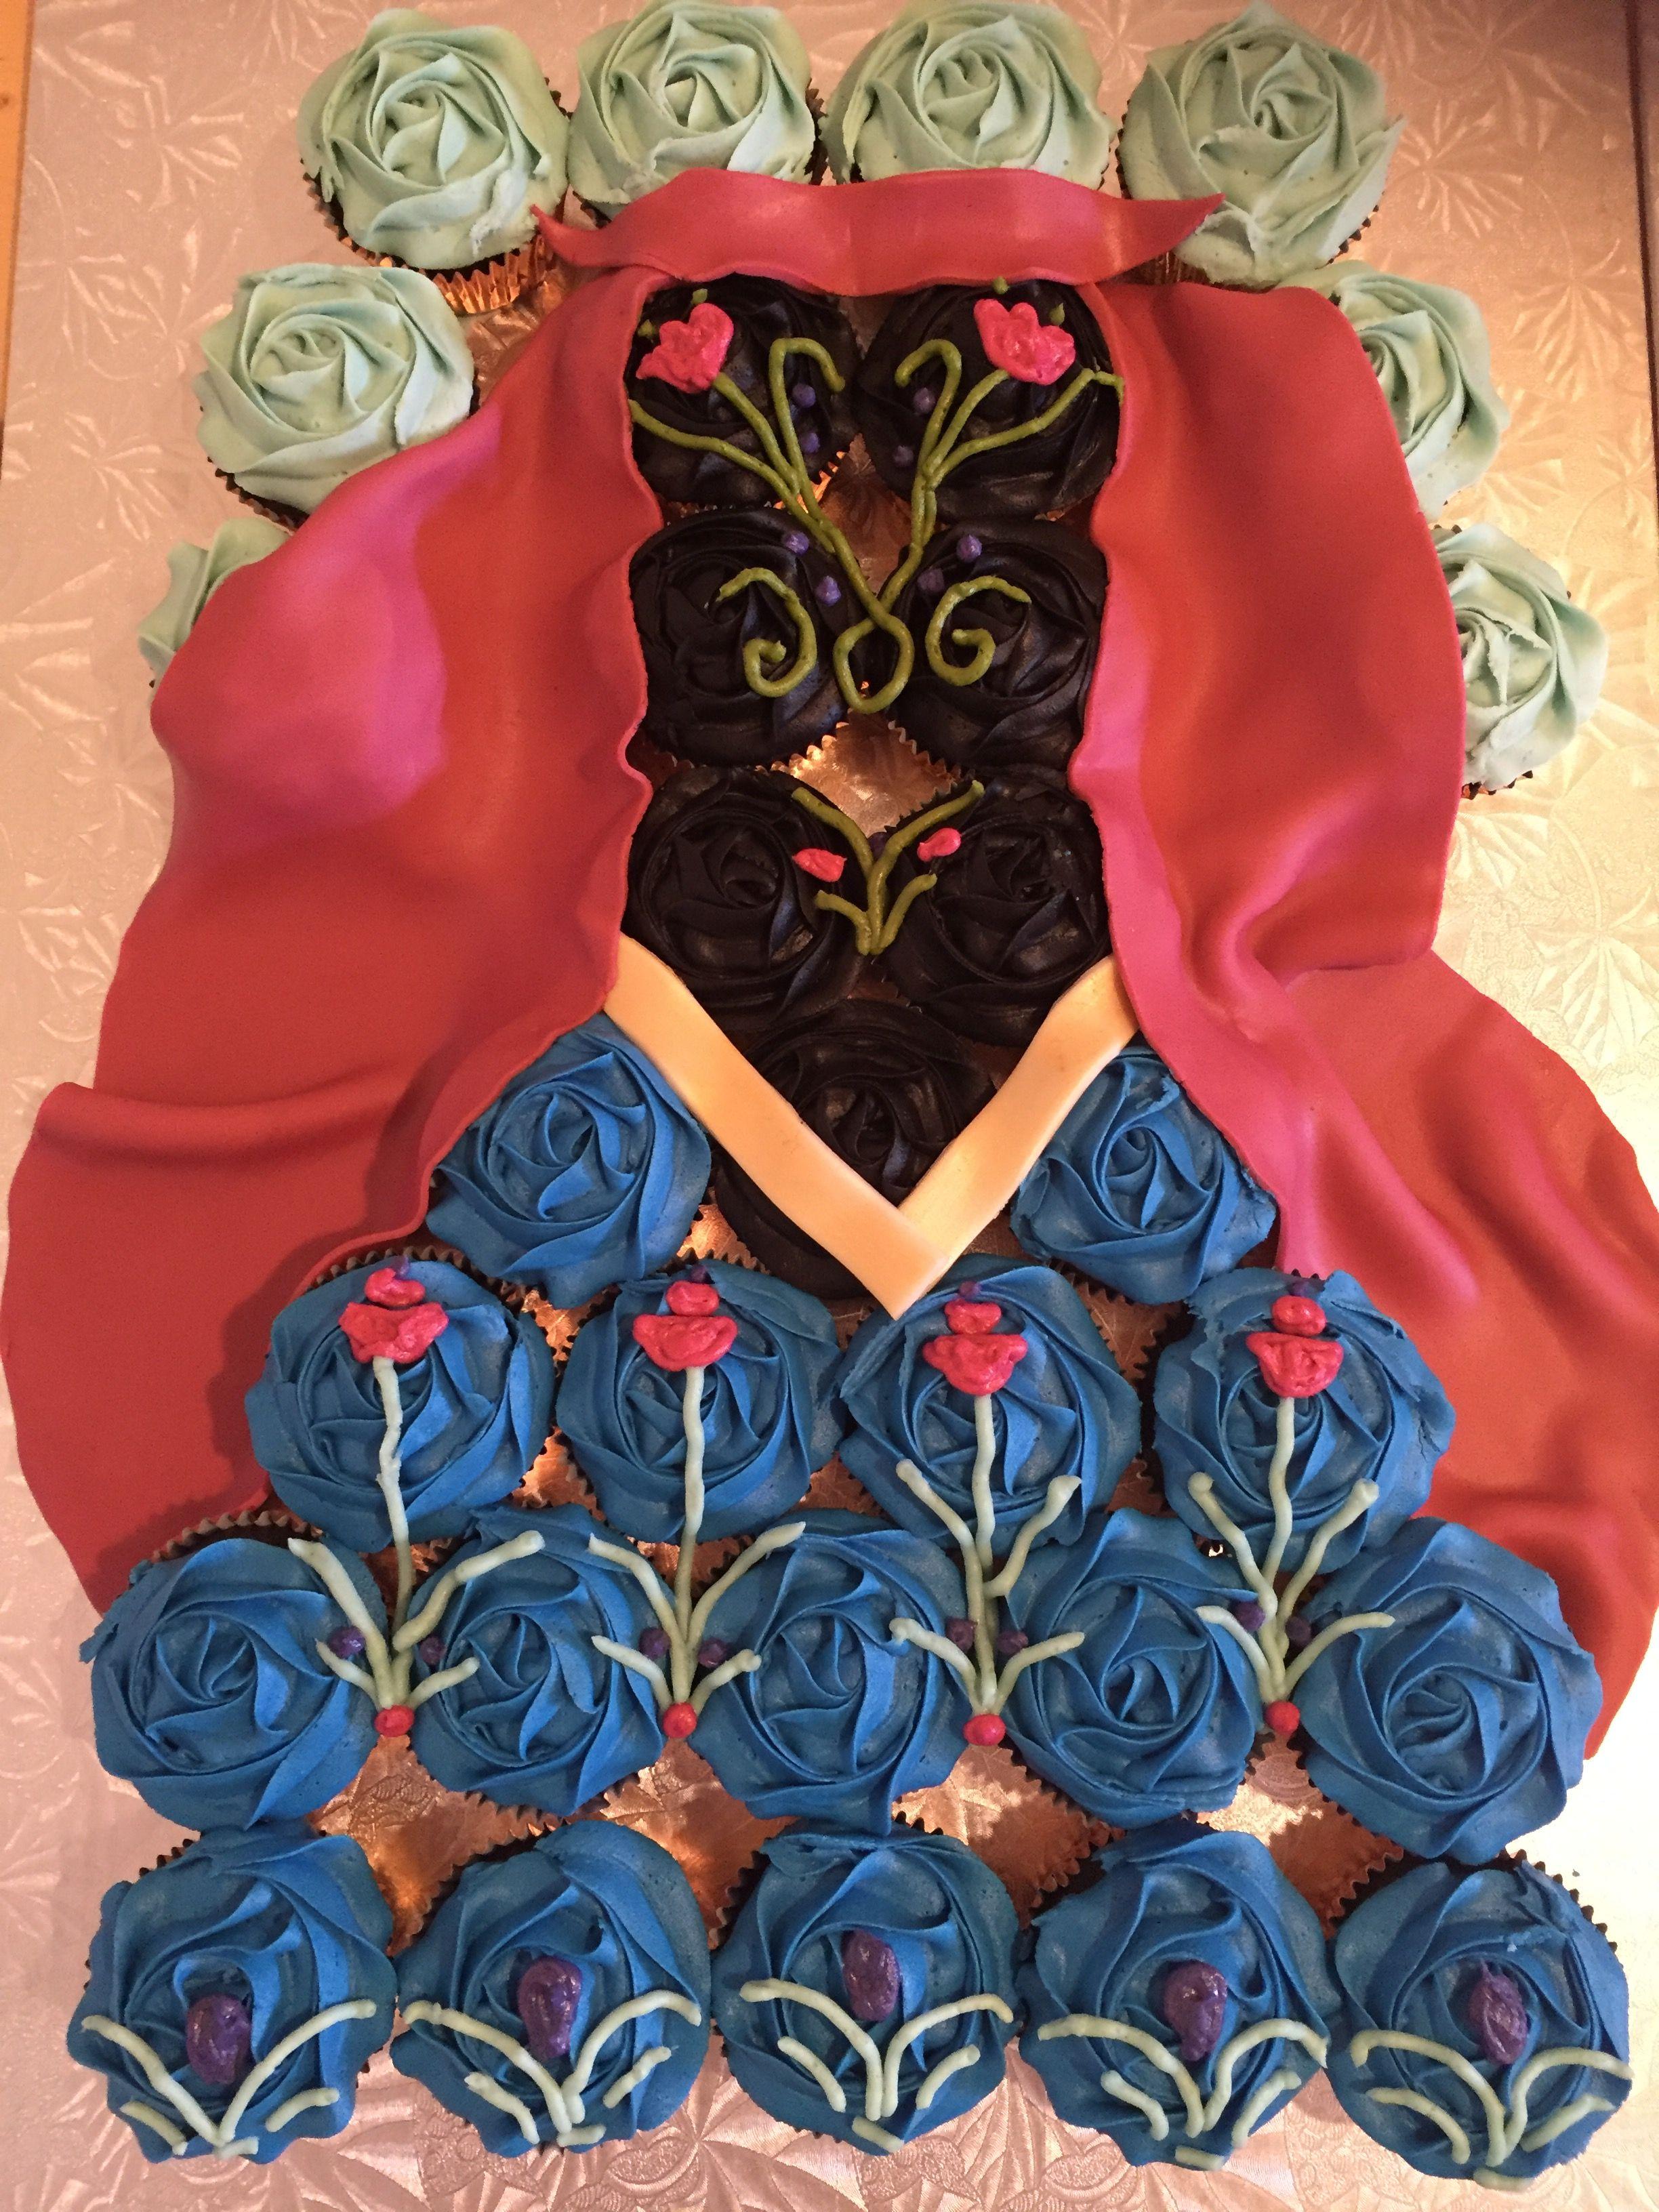 Princess Anna Cupcake Dress Cake #frozencupcakecake #frozen #anna #princessanna #cupcake #cake #dress